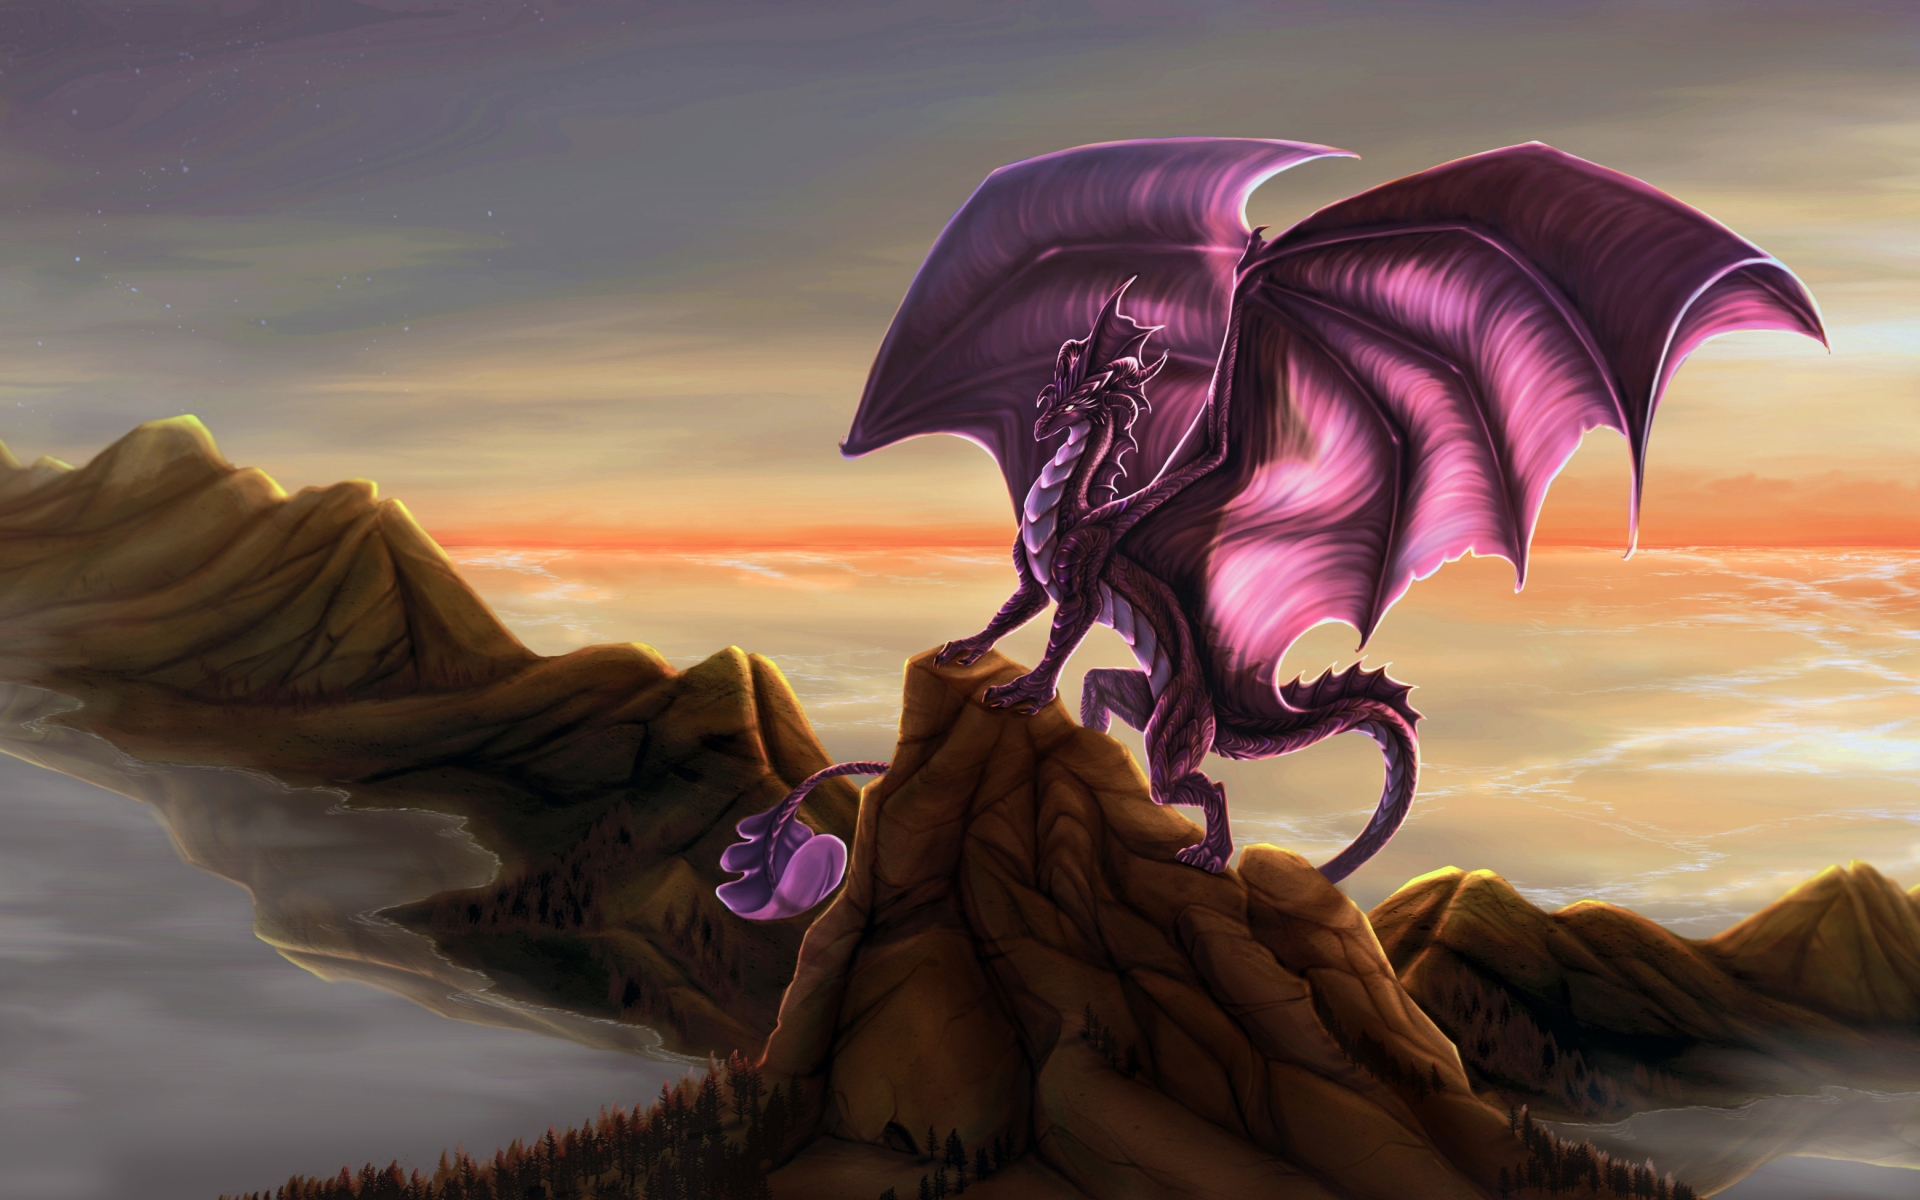 Dragones - 1920x1200